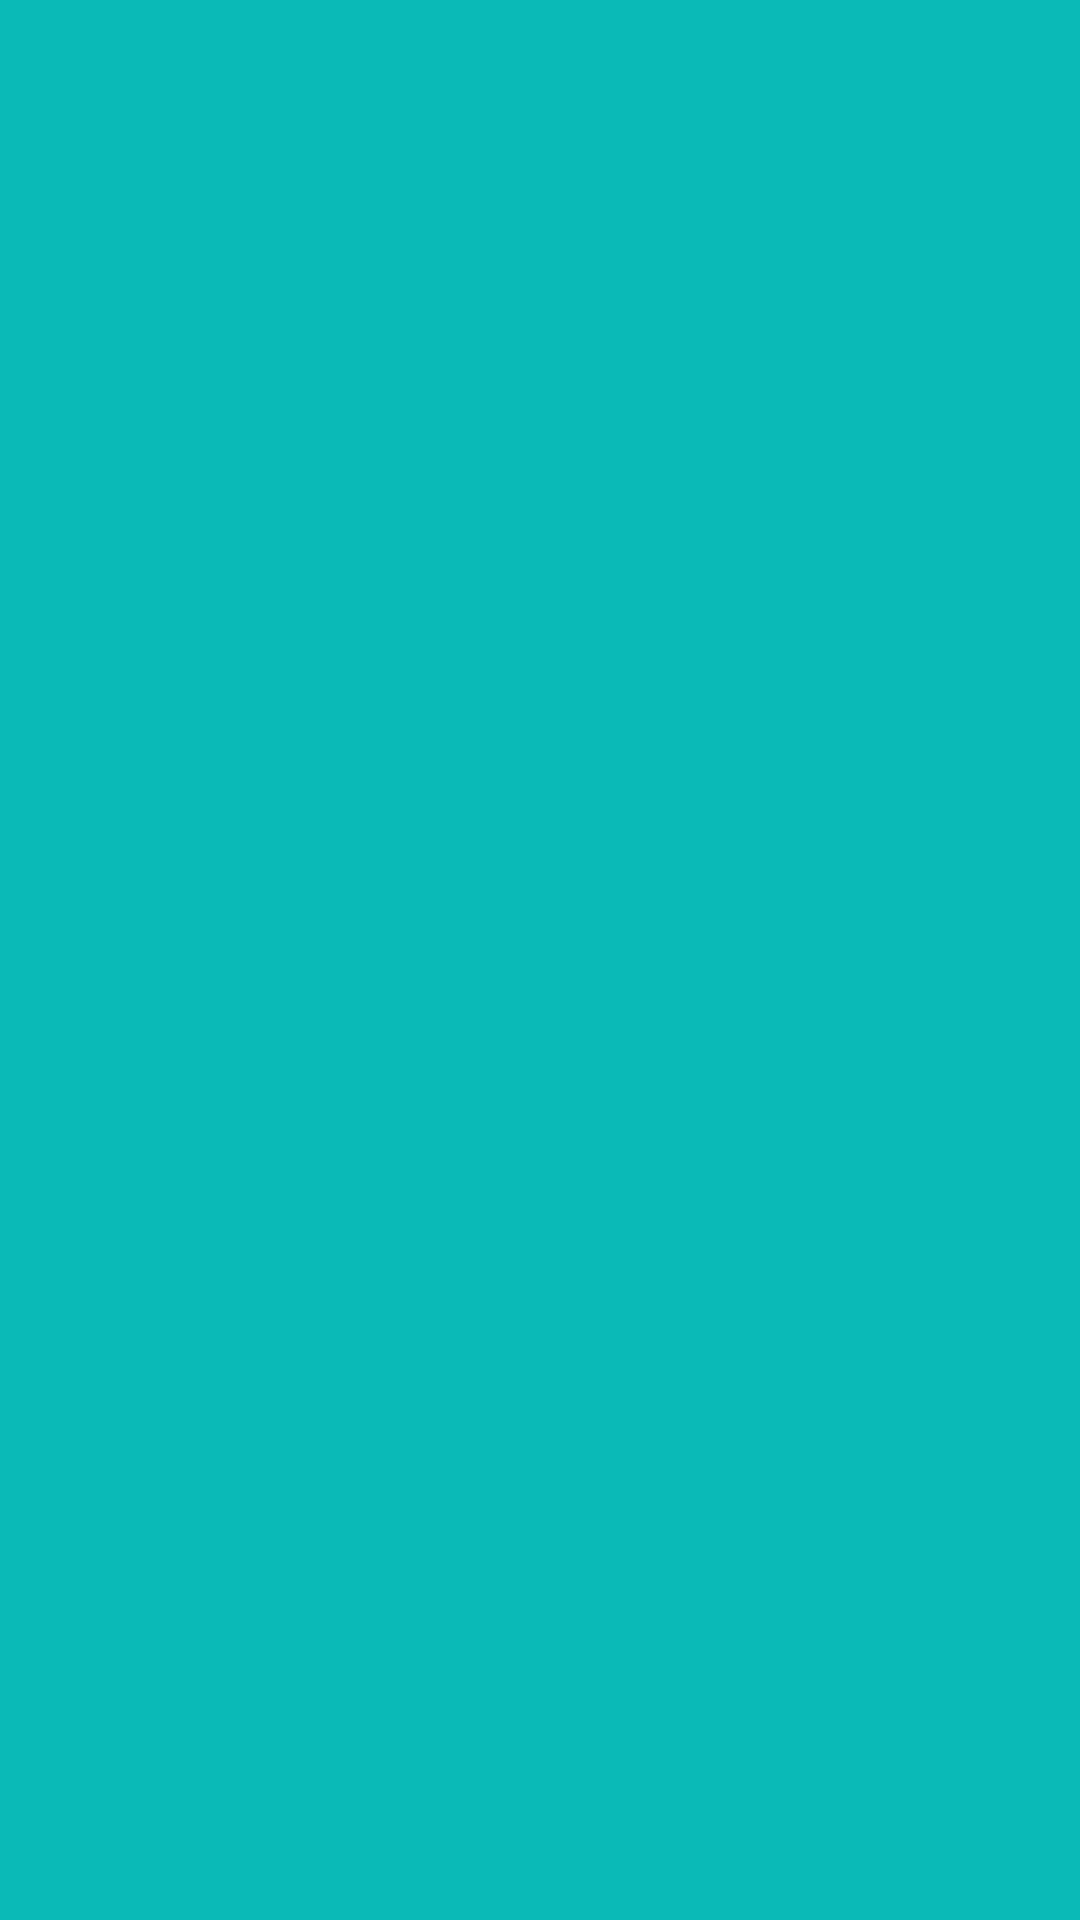 https://wallpaperformobile.org/13966/plain-colored-backgrounds.